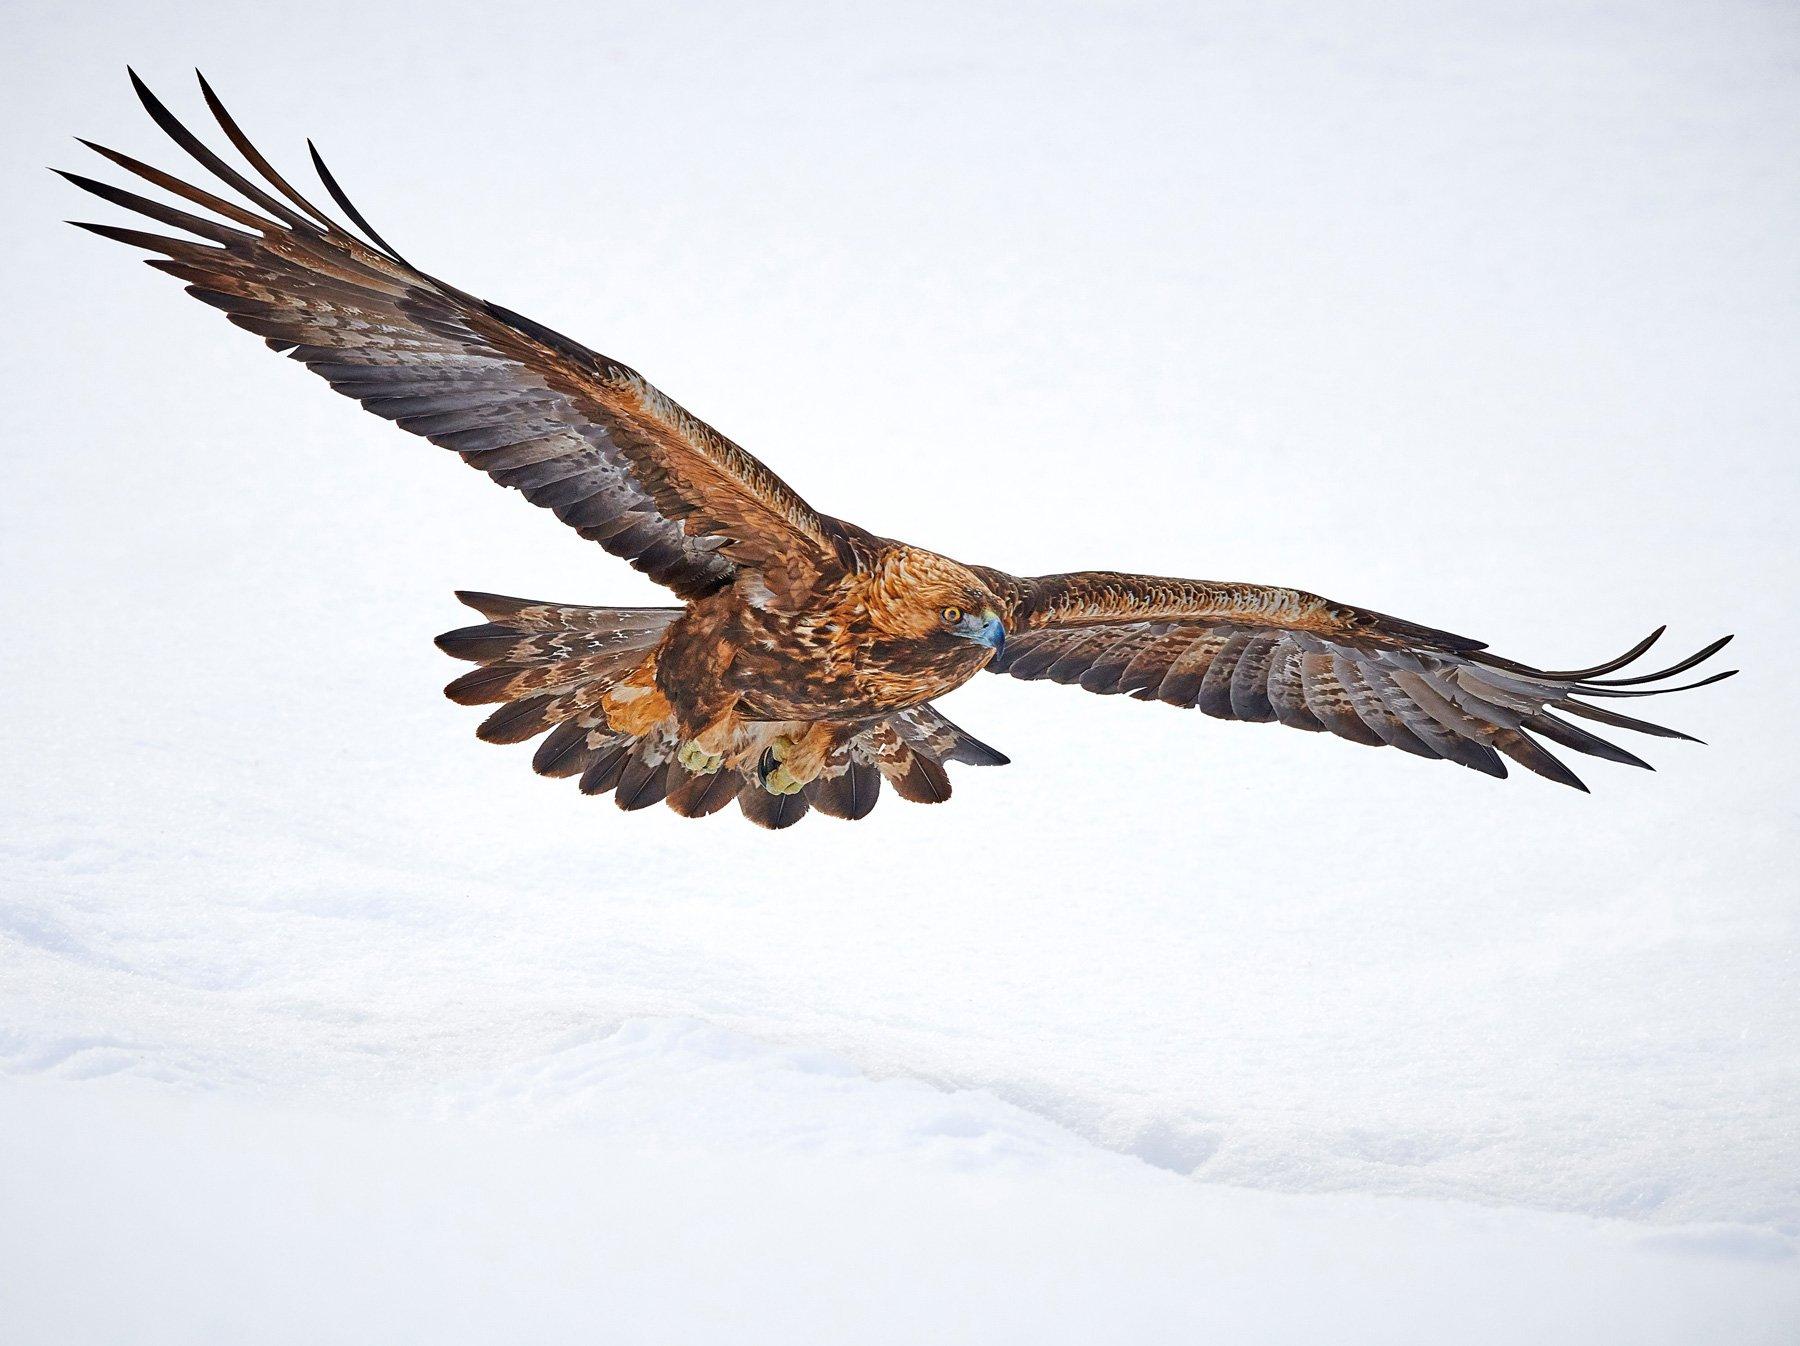 A golden eagle in flight, Finland.